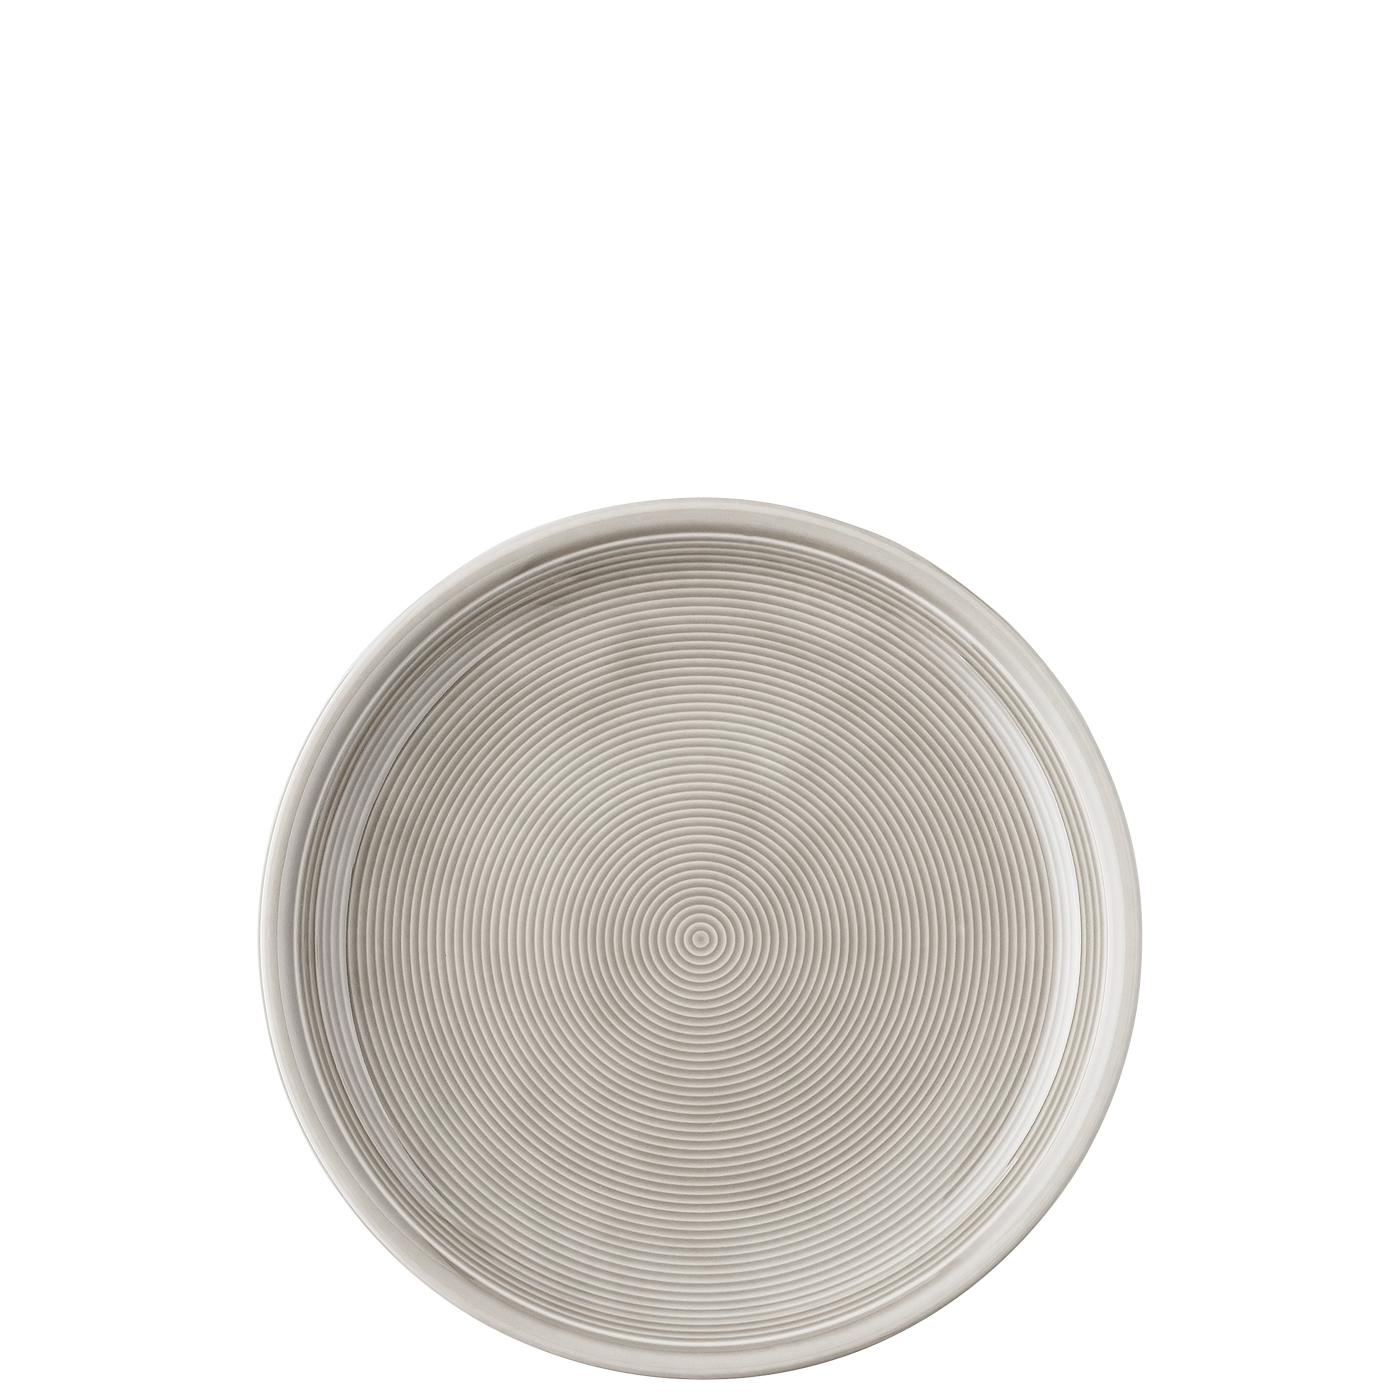 Frühstücksteller 22 cm Trend Colour Moon Grey Thomas Porzellan